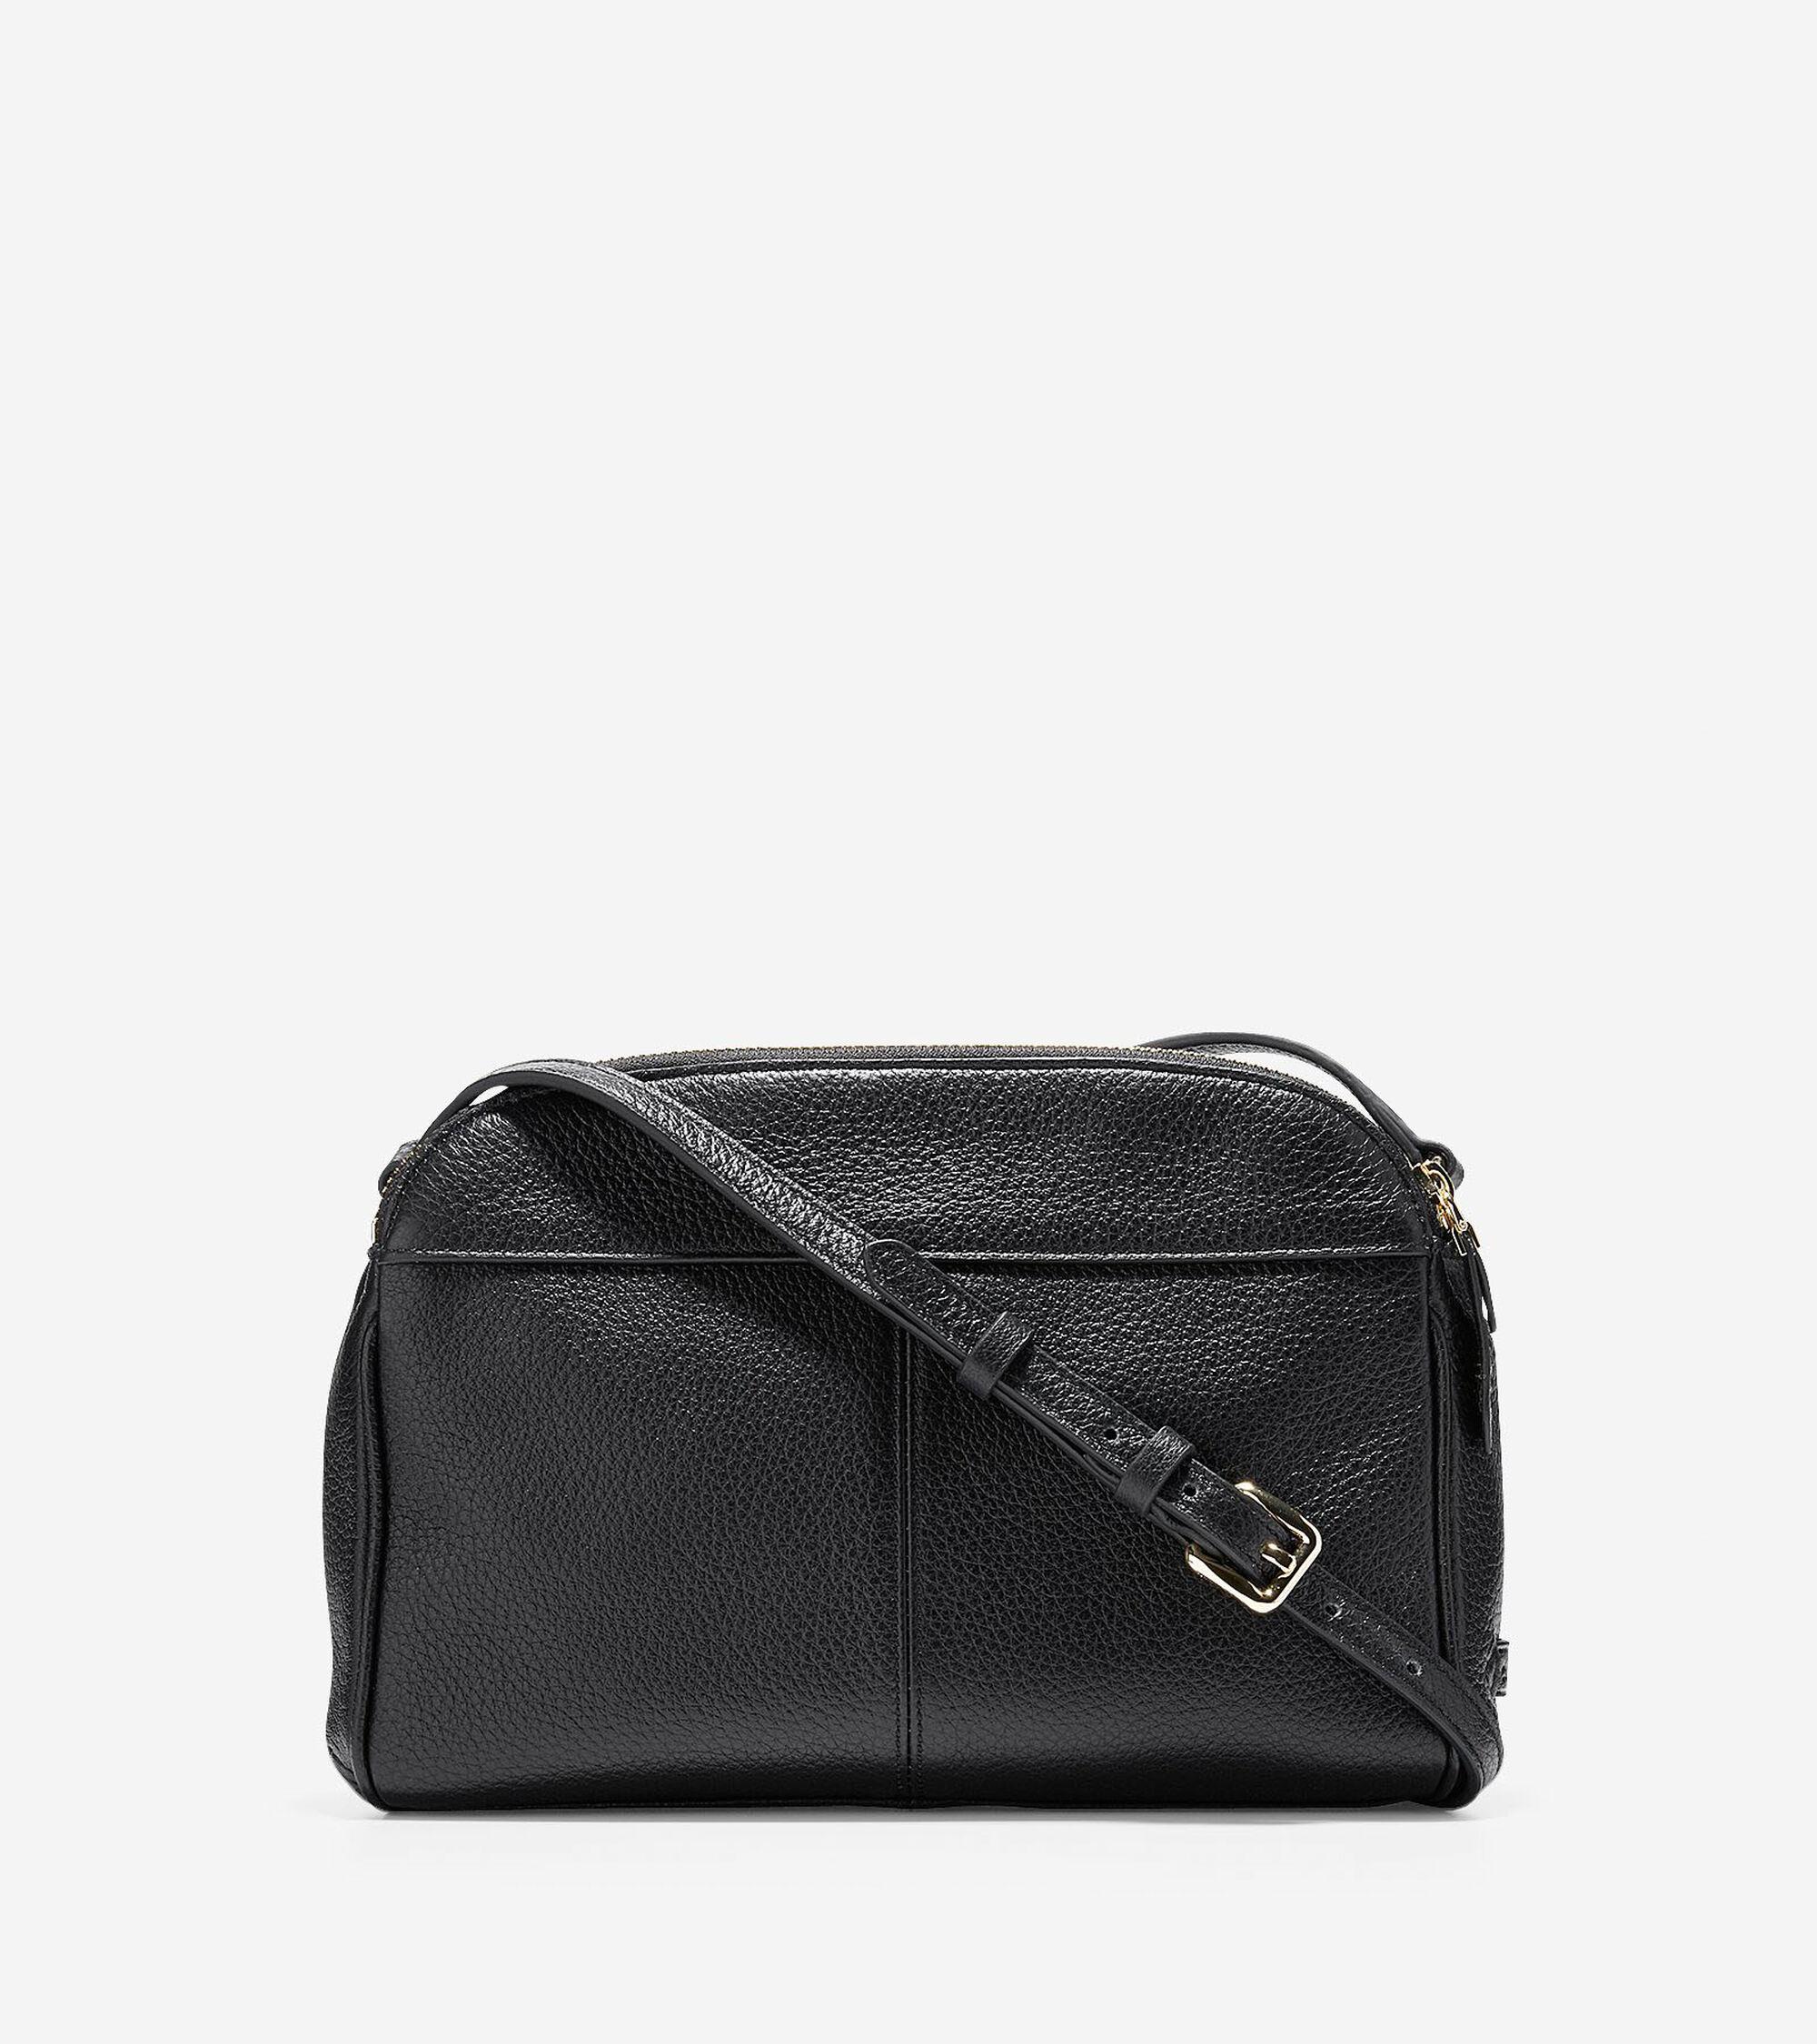 Womens Tali Double Zip Crossbody Bag in Black